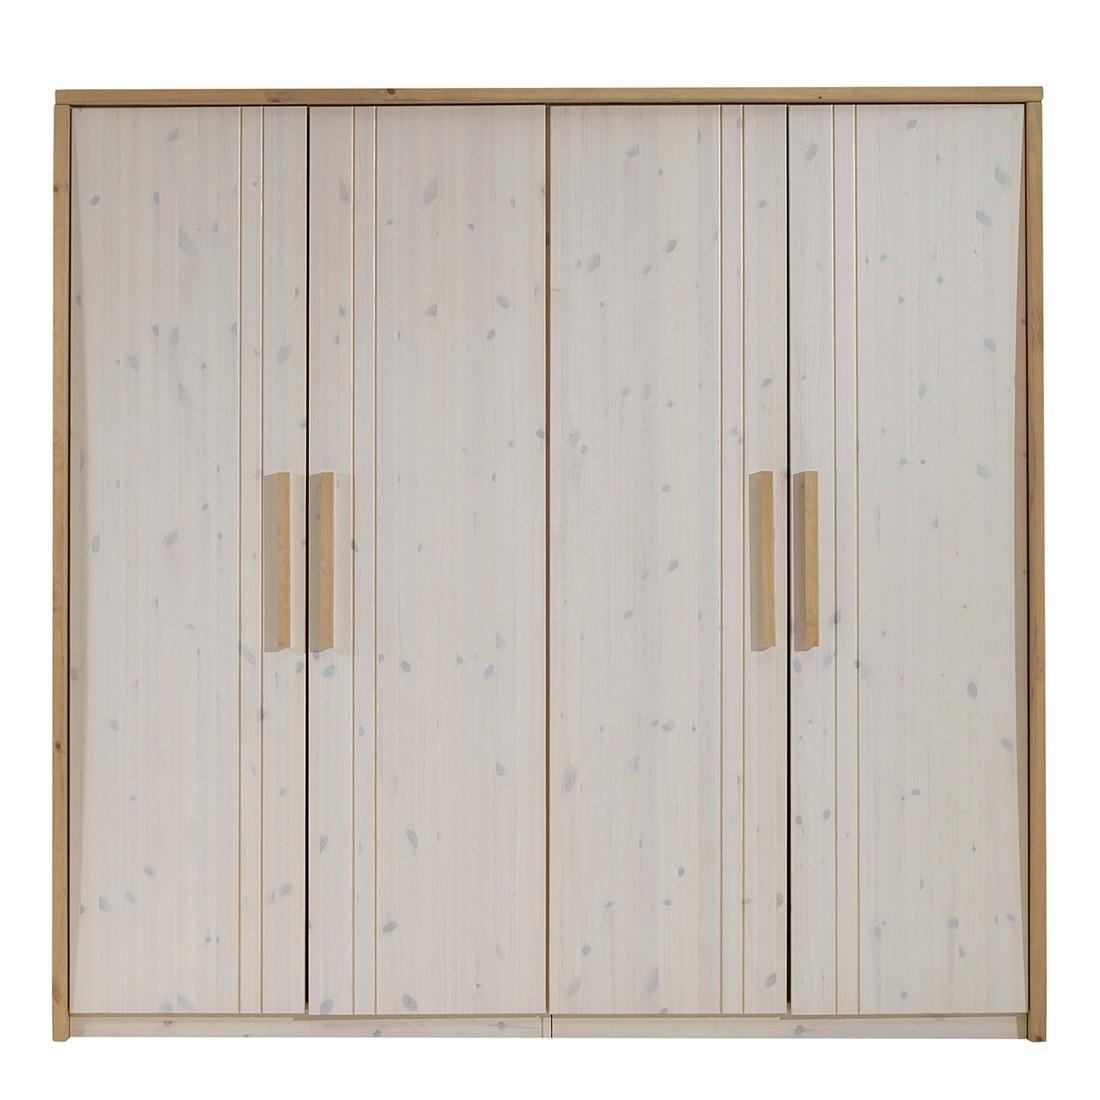 Kleiderschrank KiYDOO wood - Kiefer massiv, KIYDOO | Möbel preiswert ...